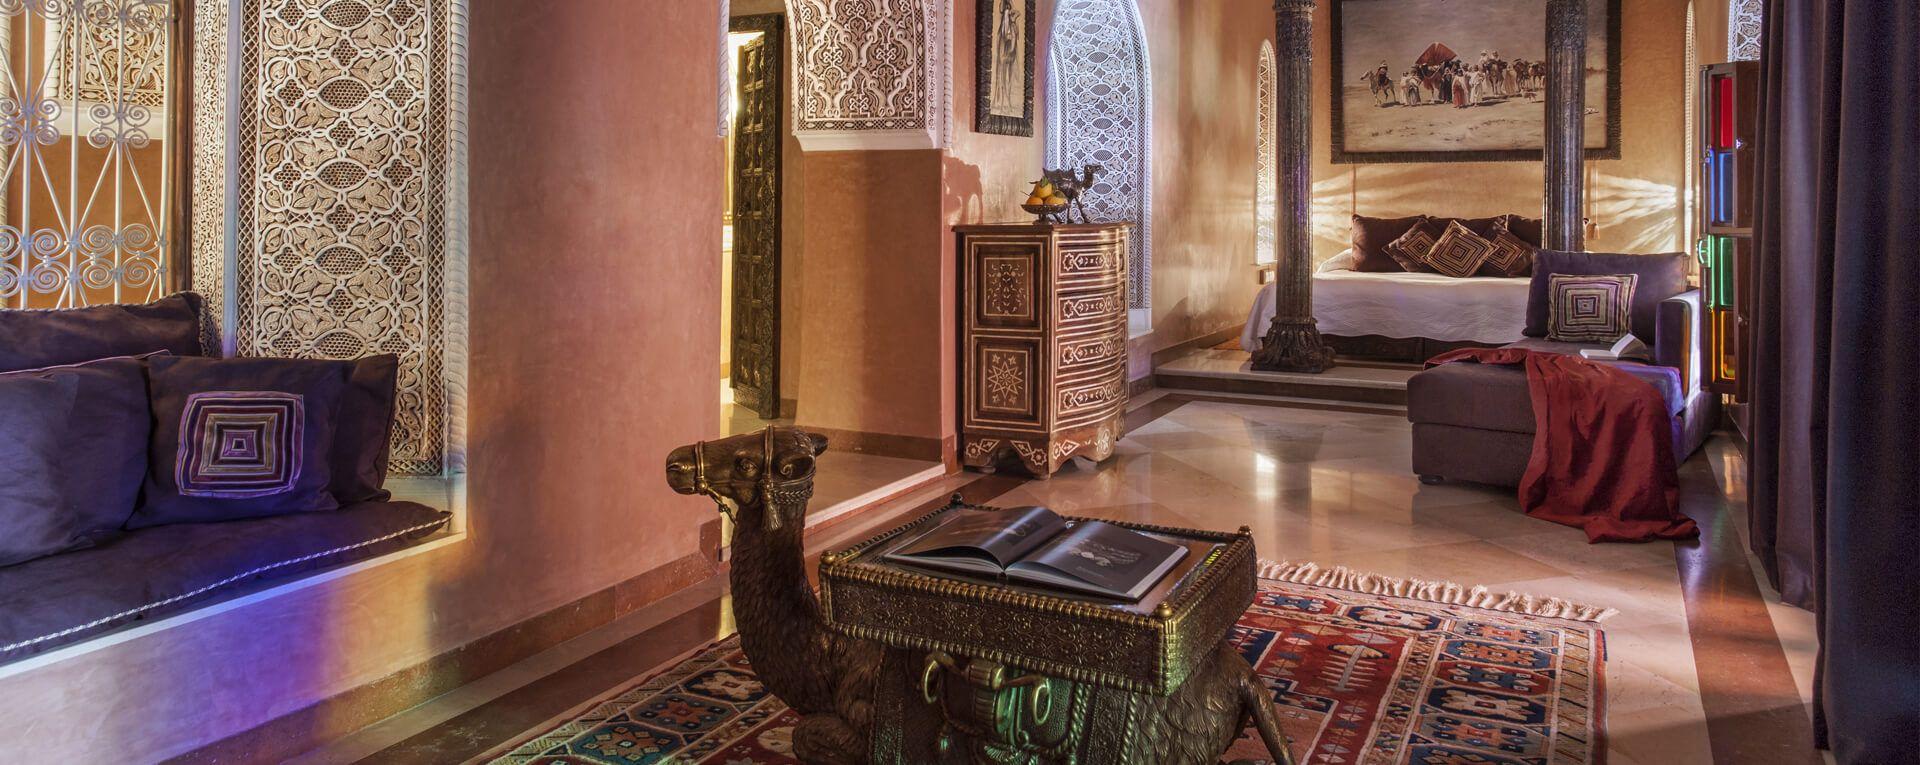 La Sultana, Marrakech